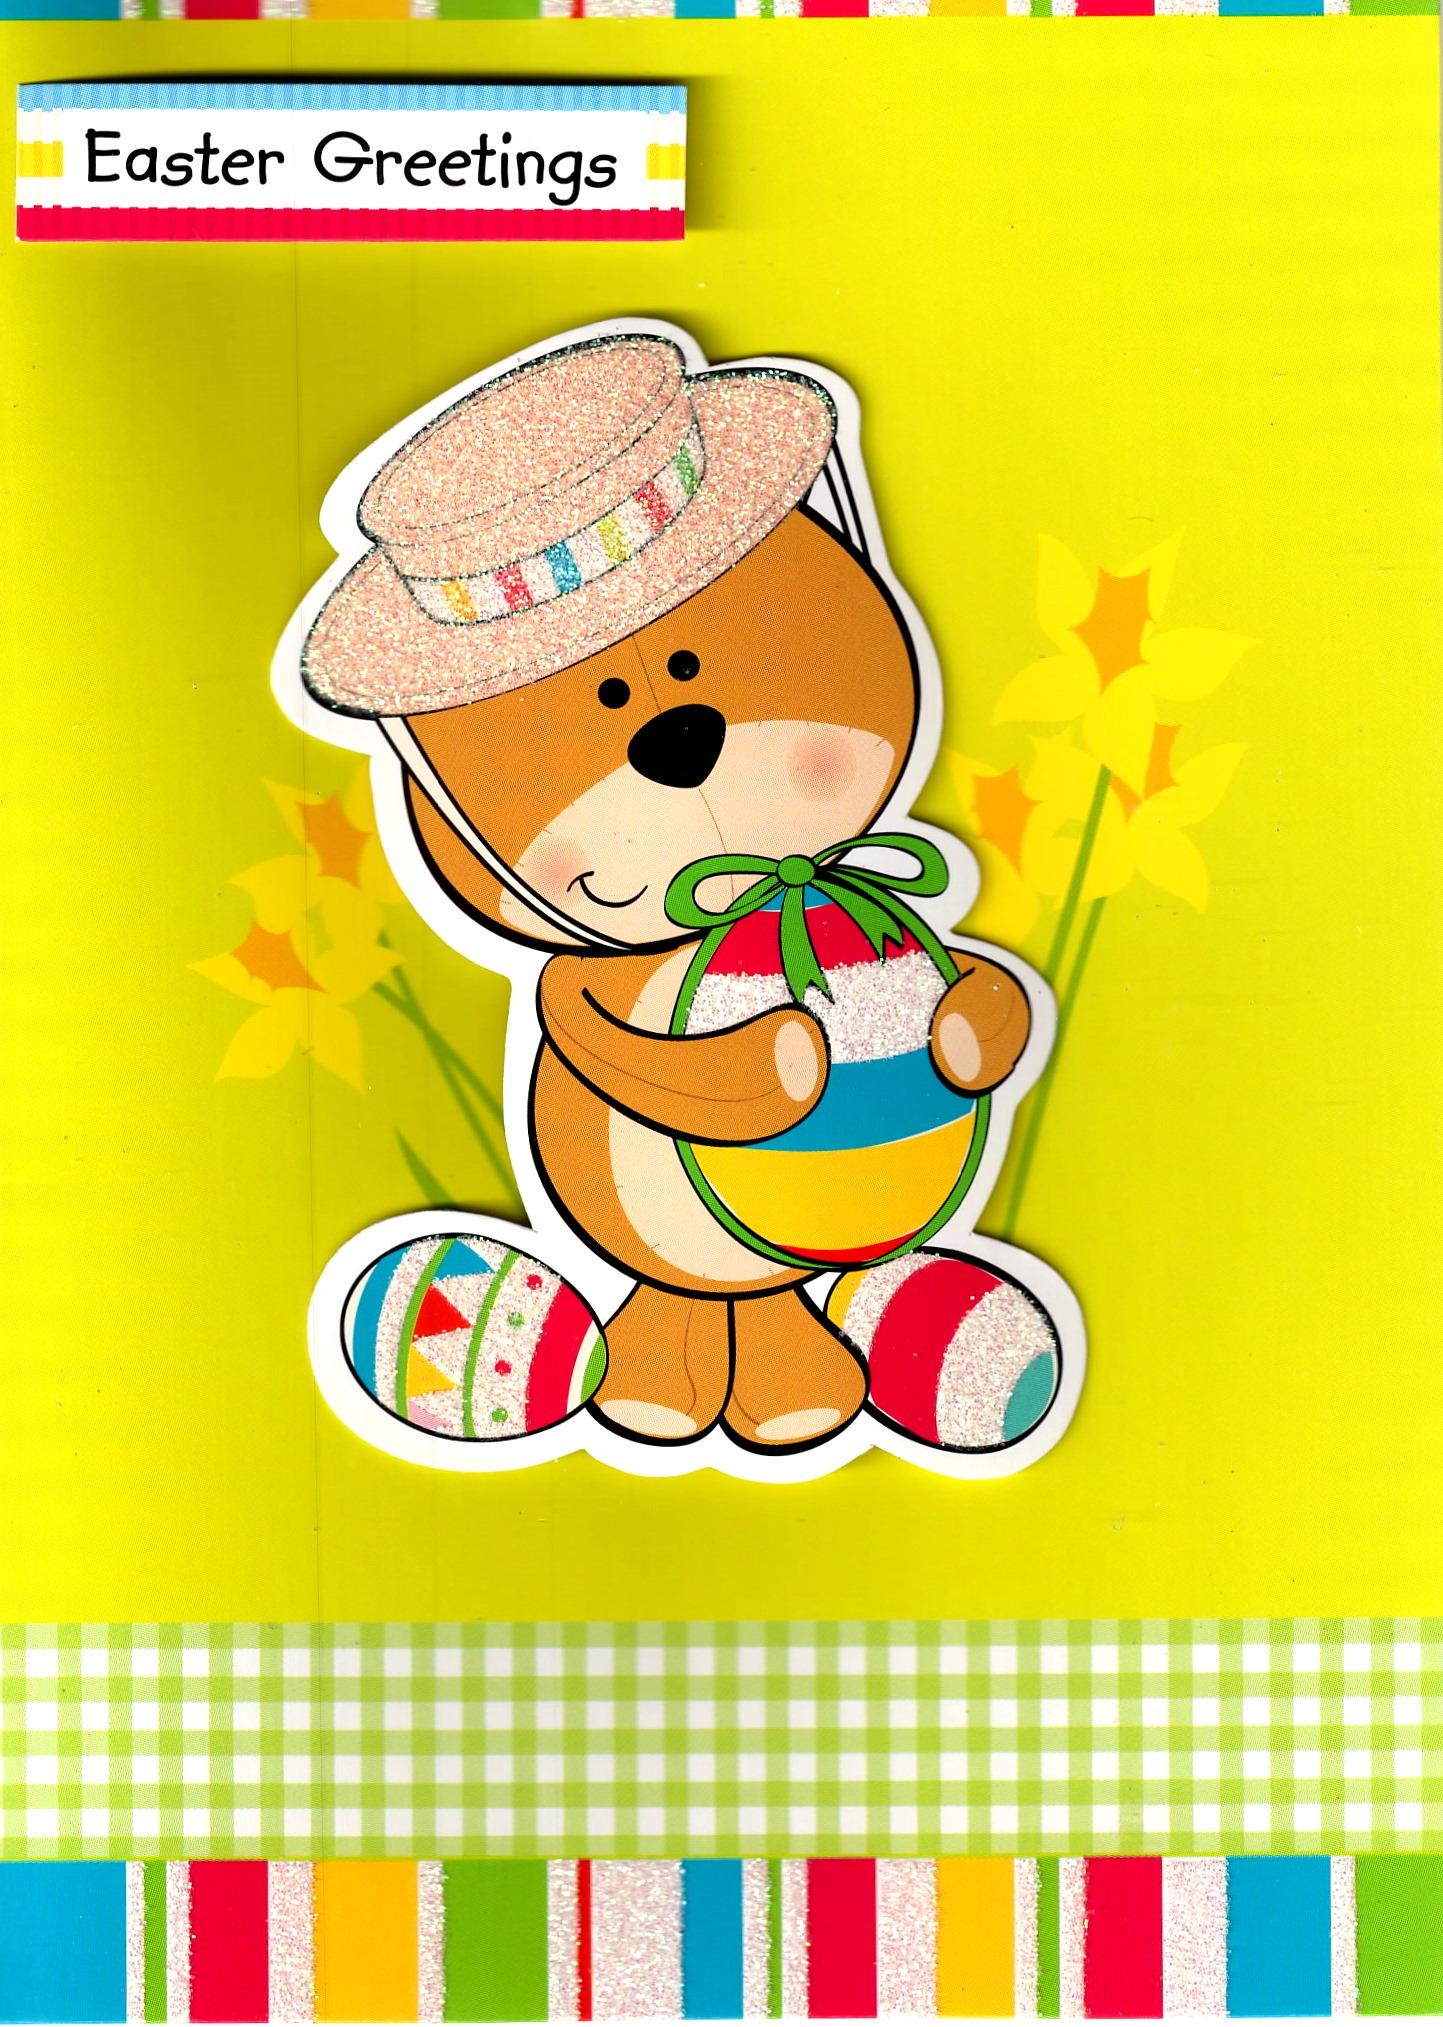 Easter greetings cute teddy kids easter card cards love kates easter greetings cute teddy kids easter card m4hsunfo